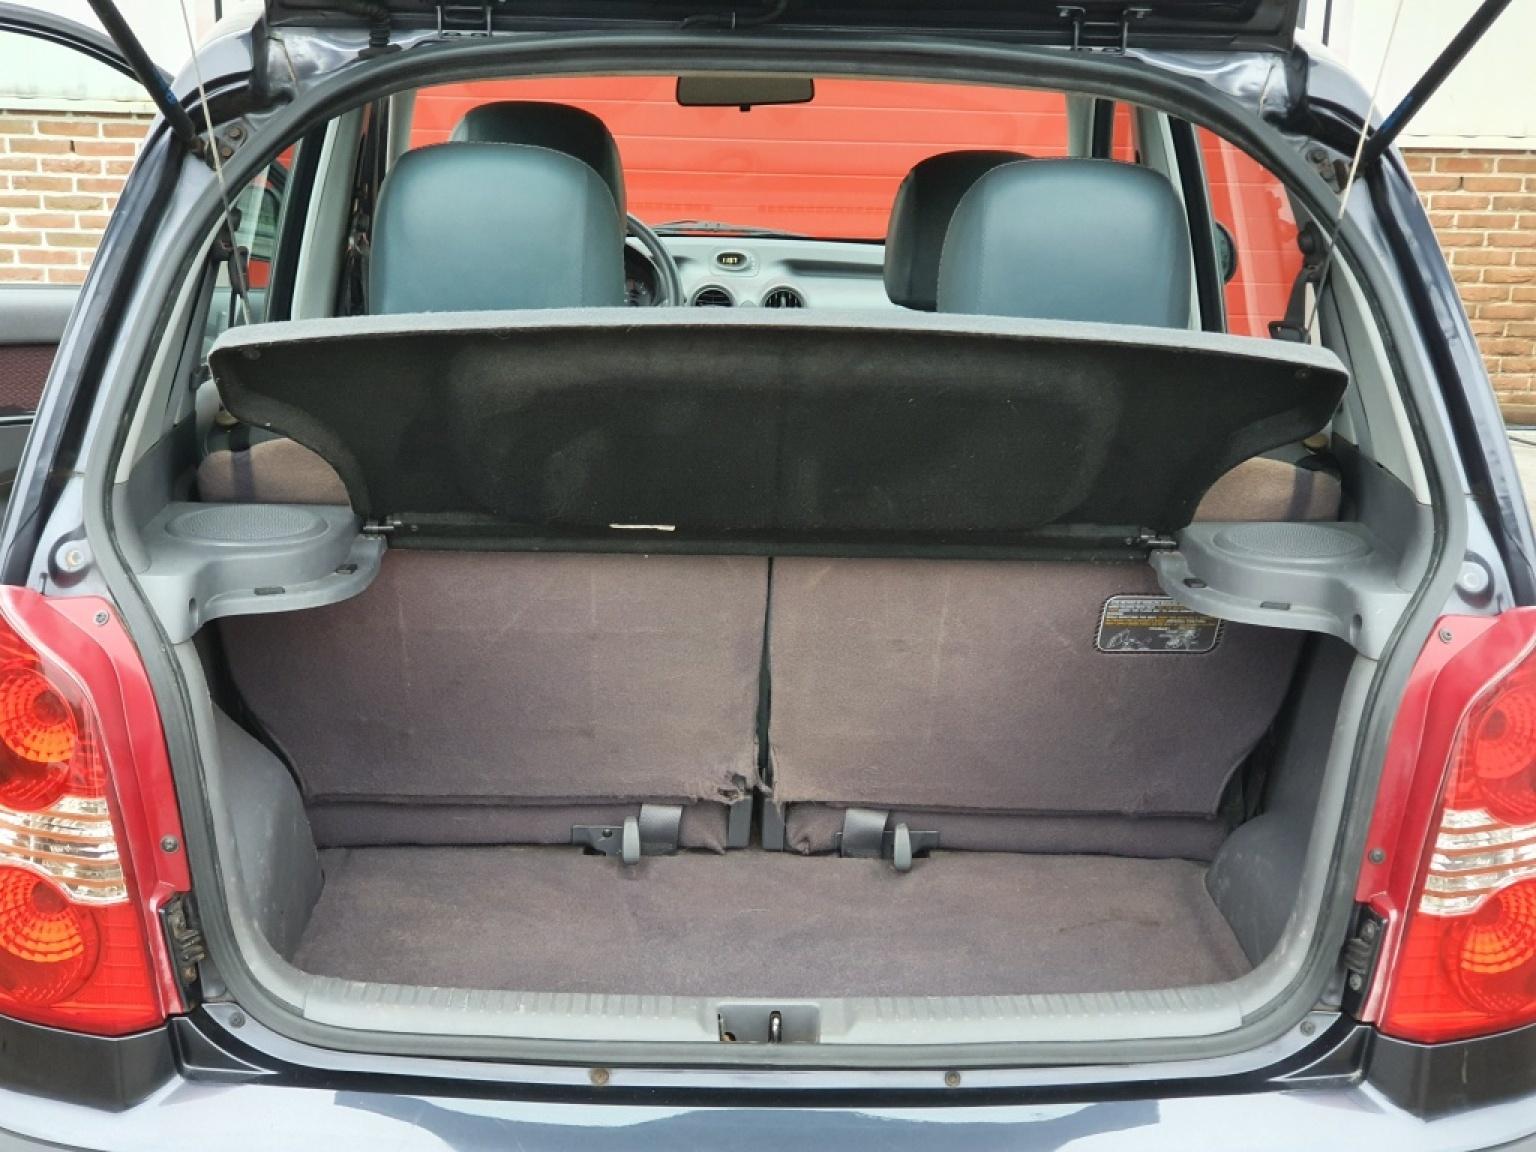 Hyundai-Atos-6